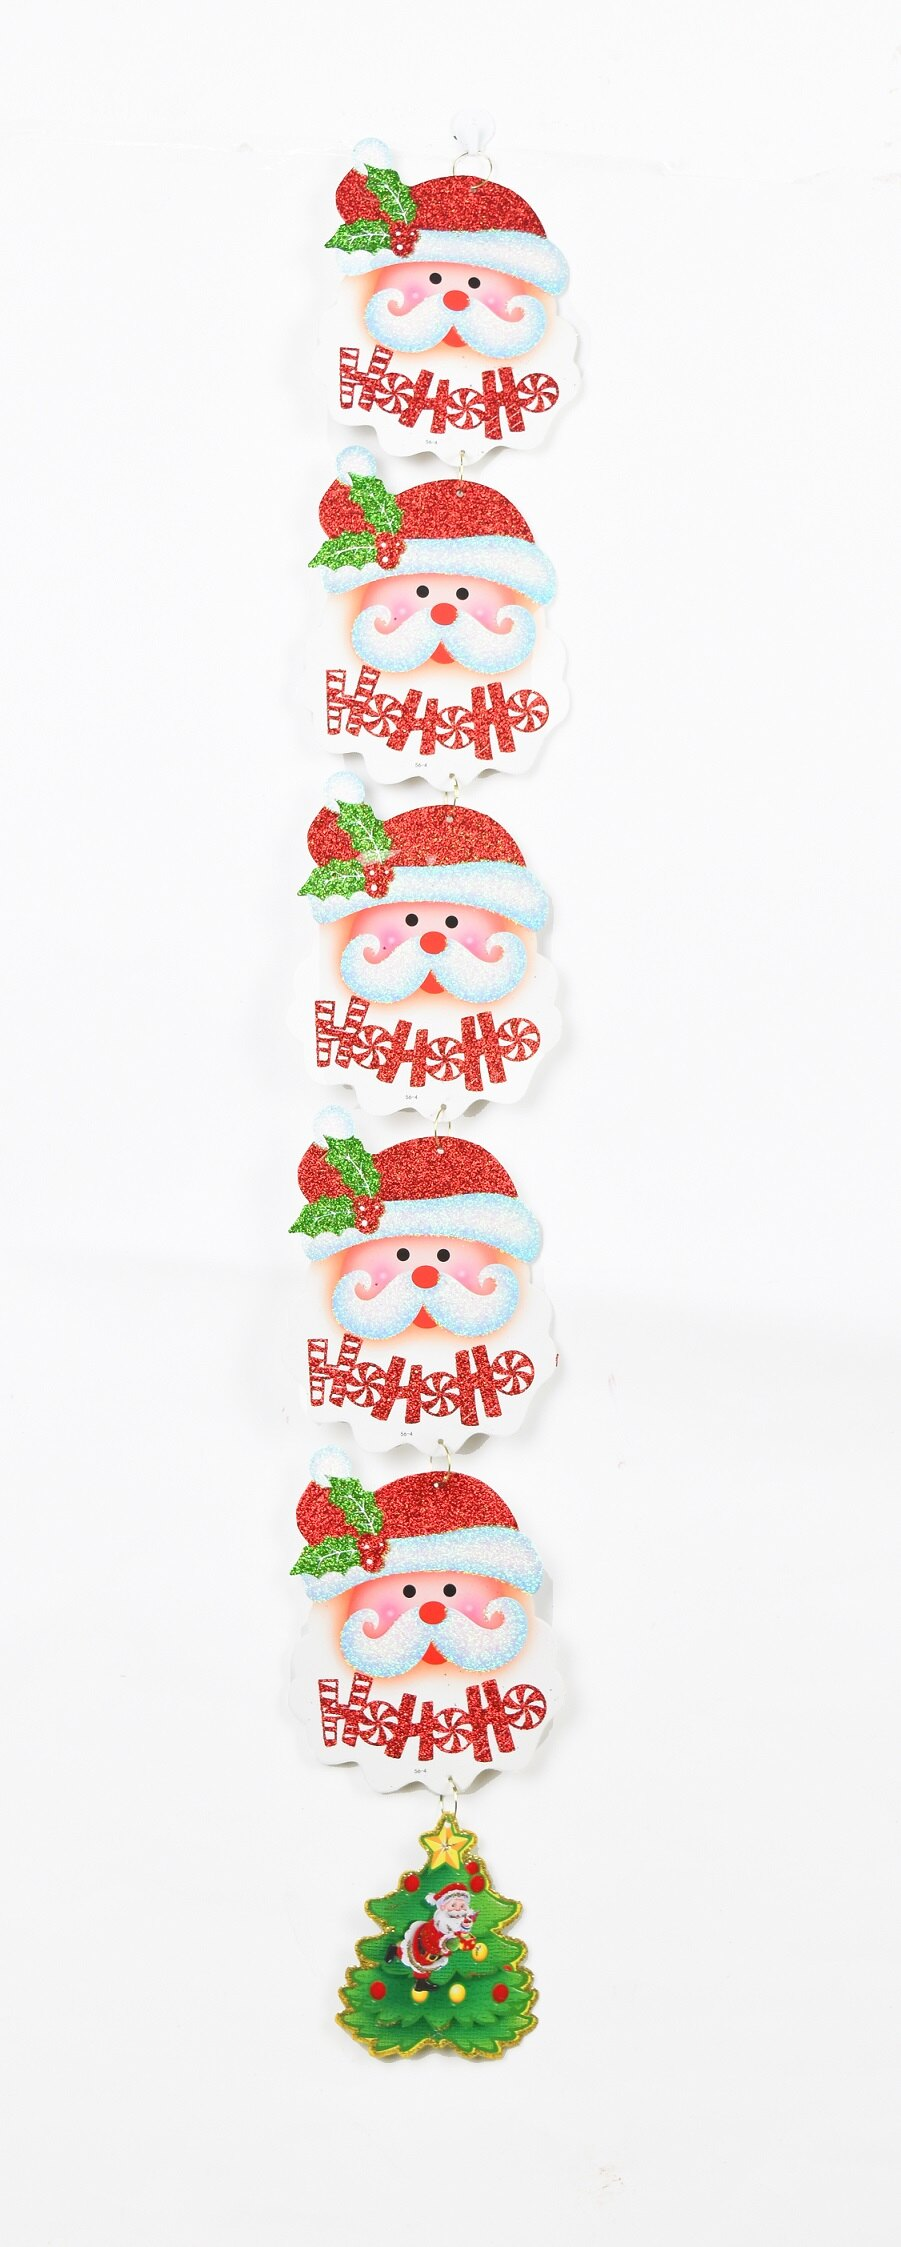 X射線【X388712】聖誕老公公頭掛小樹豎串,聖誕節/聖誕樹/聖誕佈置/聖誕掛飾/裝飾/掛飾/會場佈置/DIY/材料包